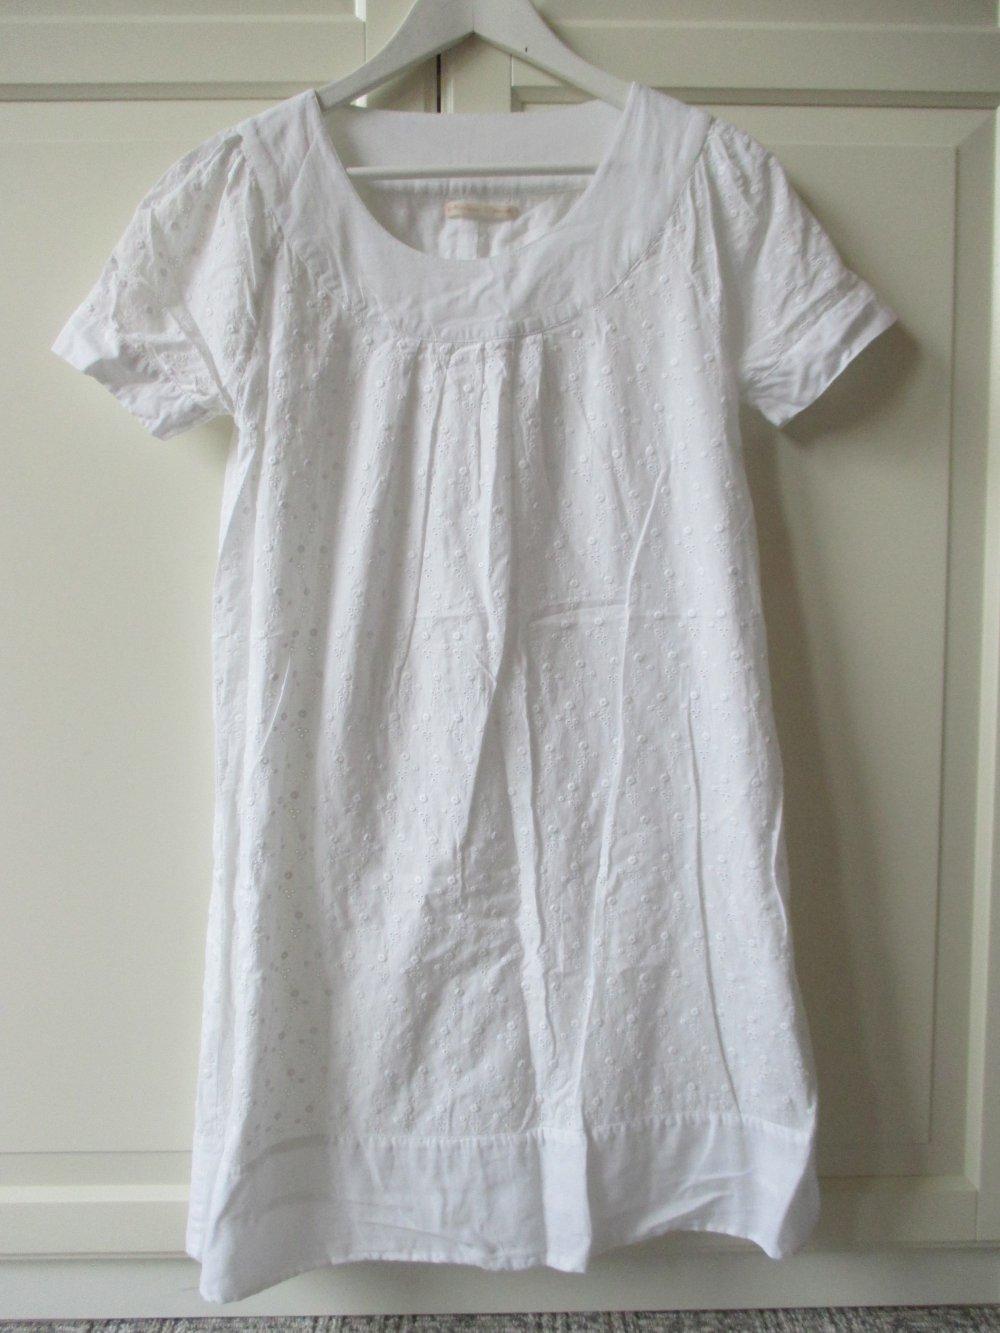 Mellow Peach, zuckersüßes weißes Kleid, Kurzarm, Lochmuster, gefüttert, Gr. 36 , Rundhals Ausschnitt